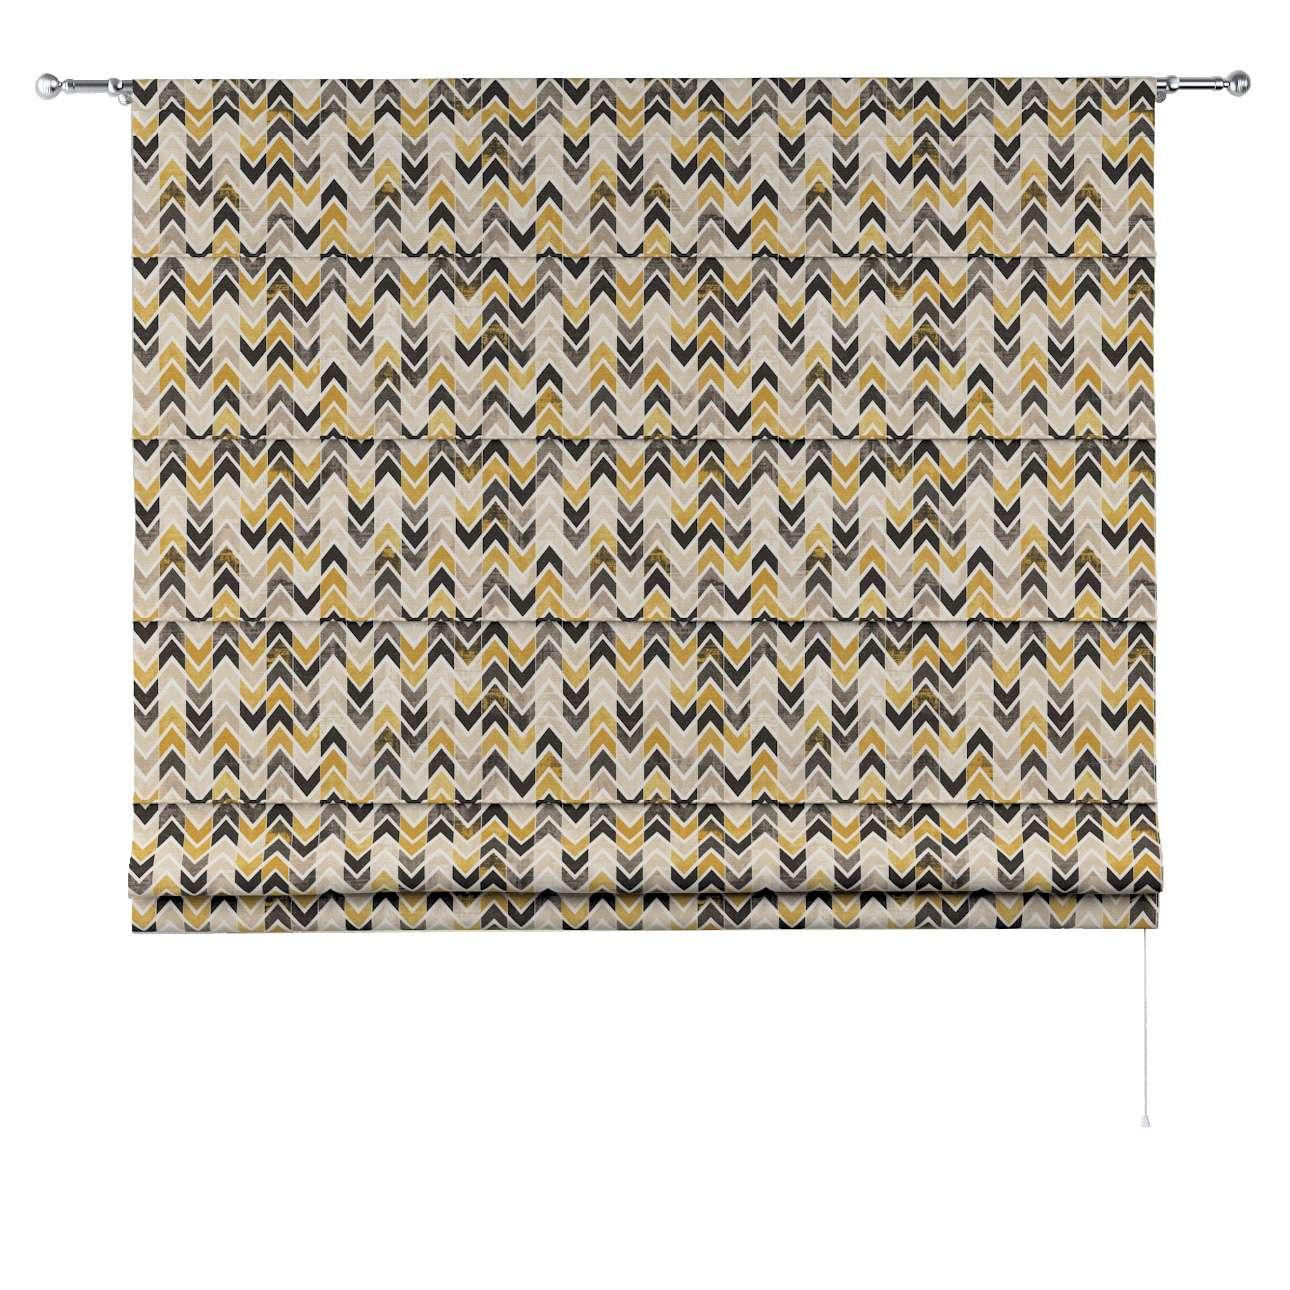 Rímska roleta Torino V kolekcii Modern, tkanina: 142-79